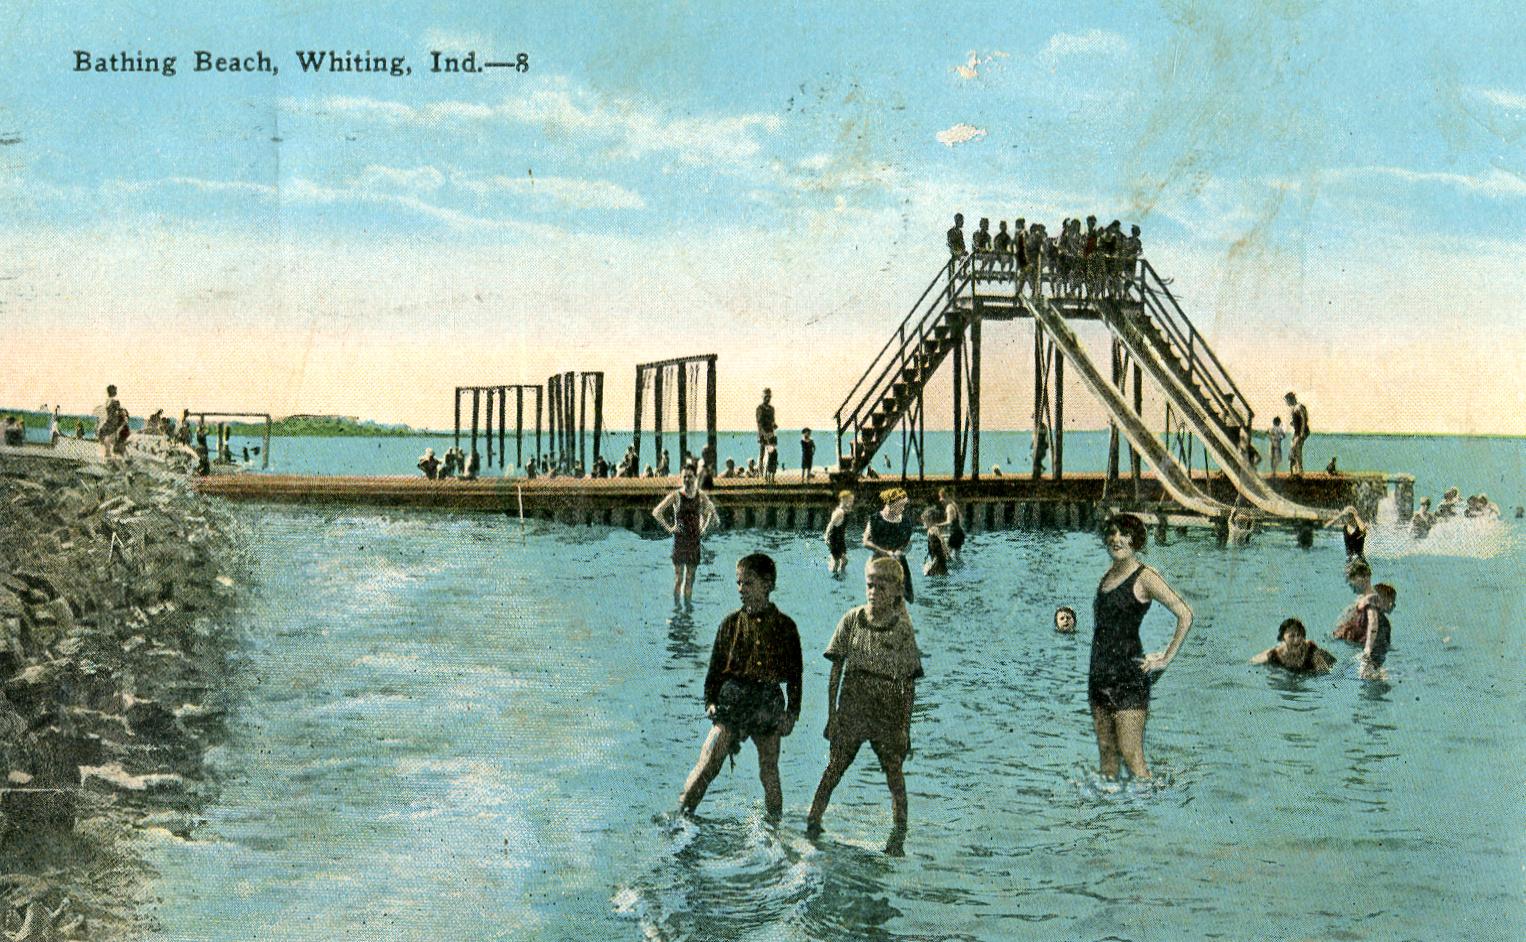 Bathing Beach Postcard.tif.jpg